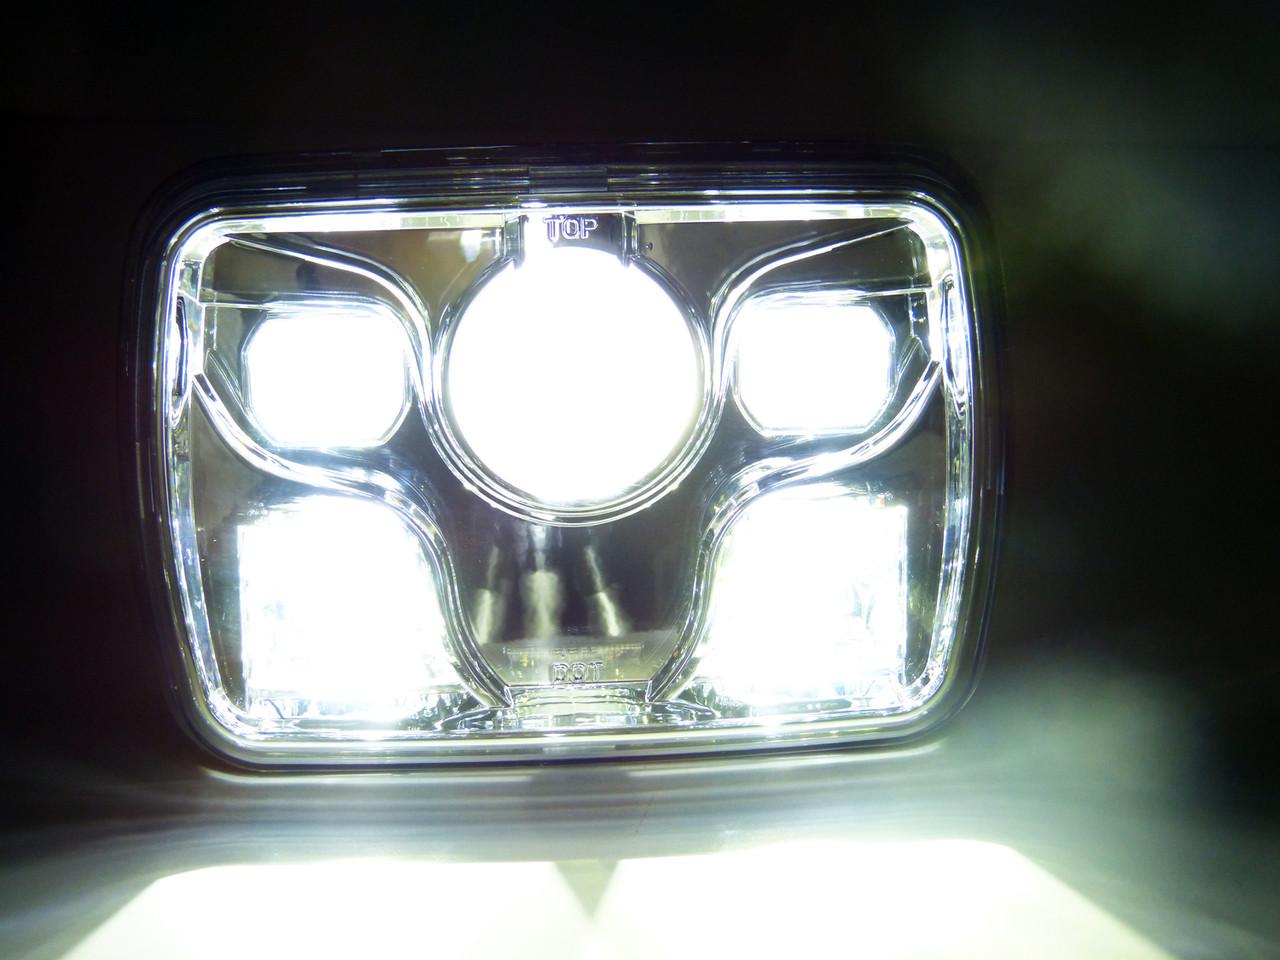 GENSSI 7×6 H6054 200mm LED Projector Headlights DOT Chrome Set - GENSSI [ 960 x 1280 Pixel ]